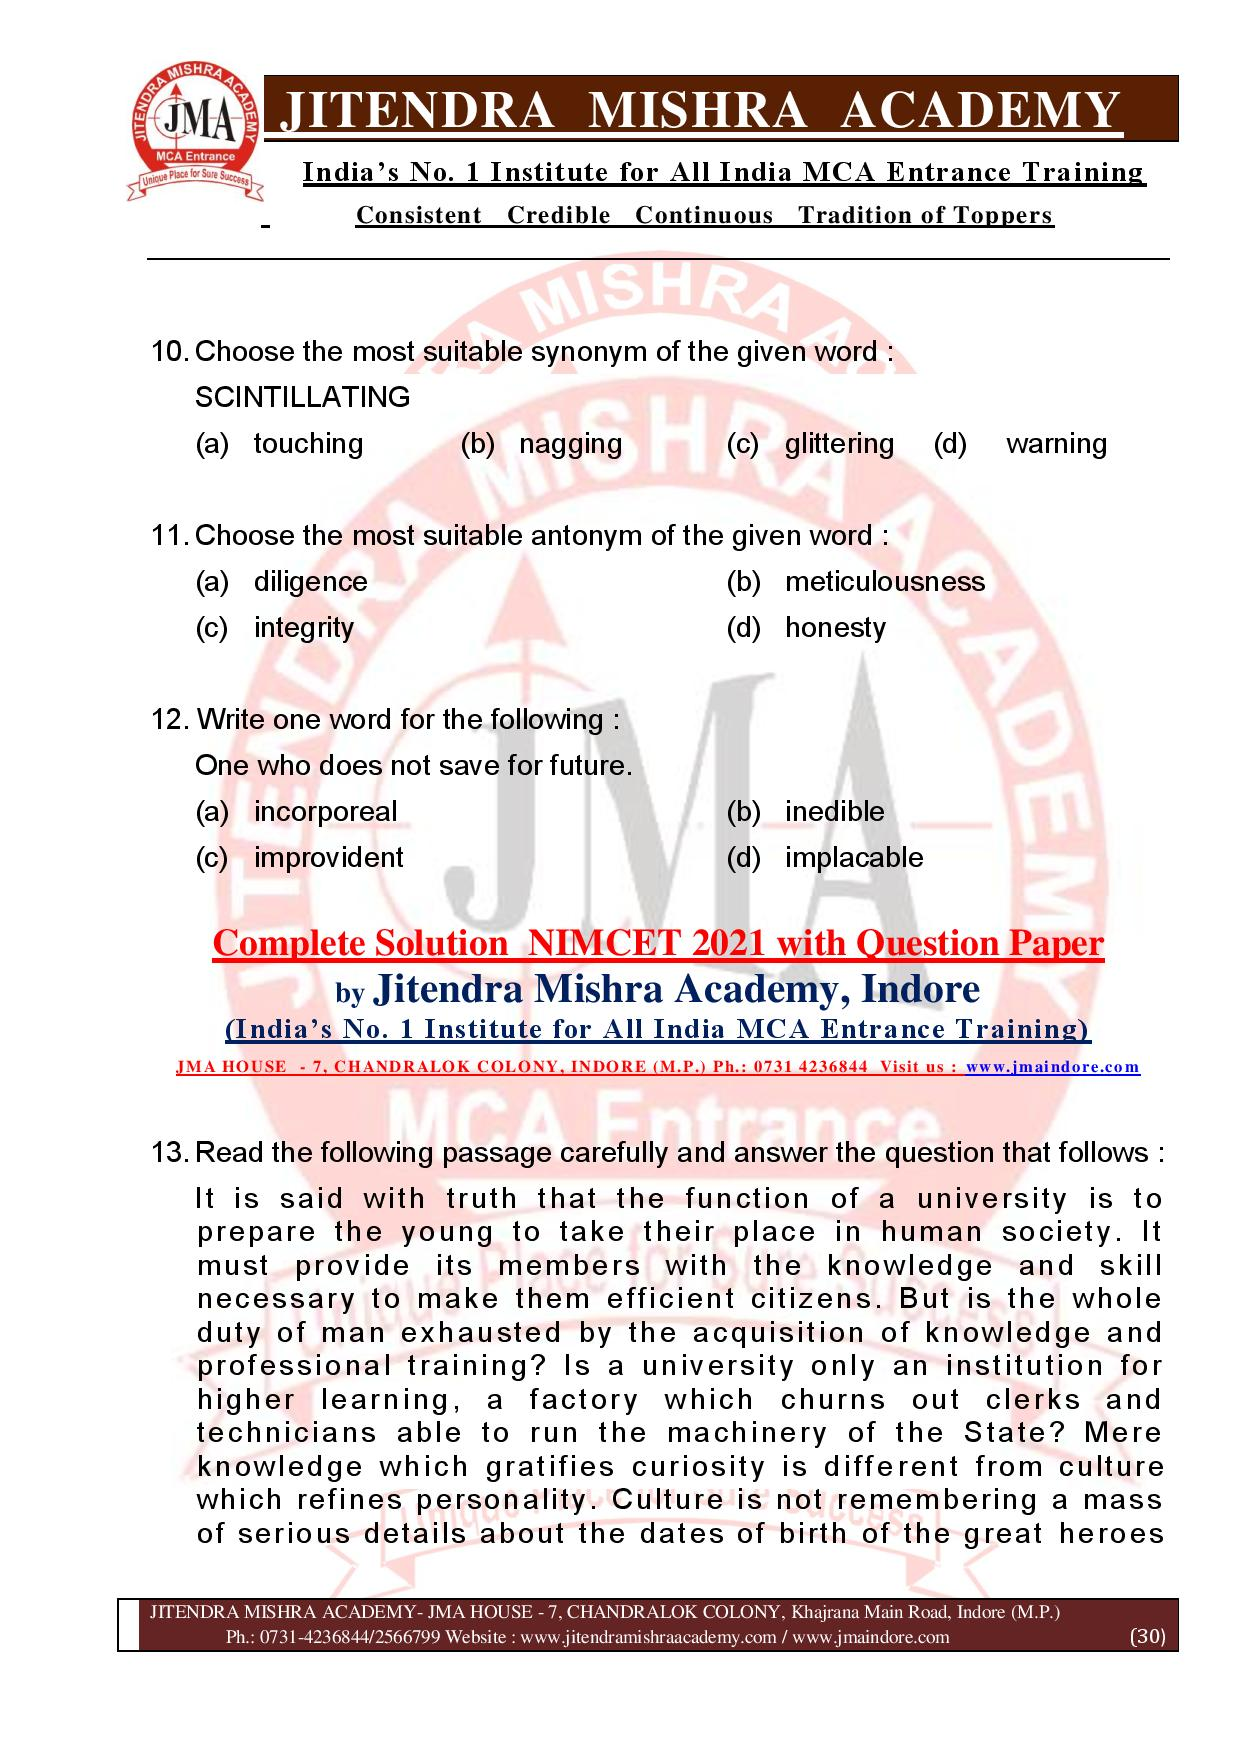 NIMCET 2021 QUESTION PAPER (F)-page-030